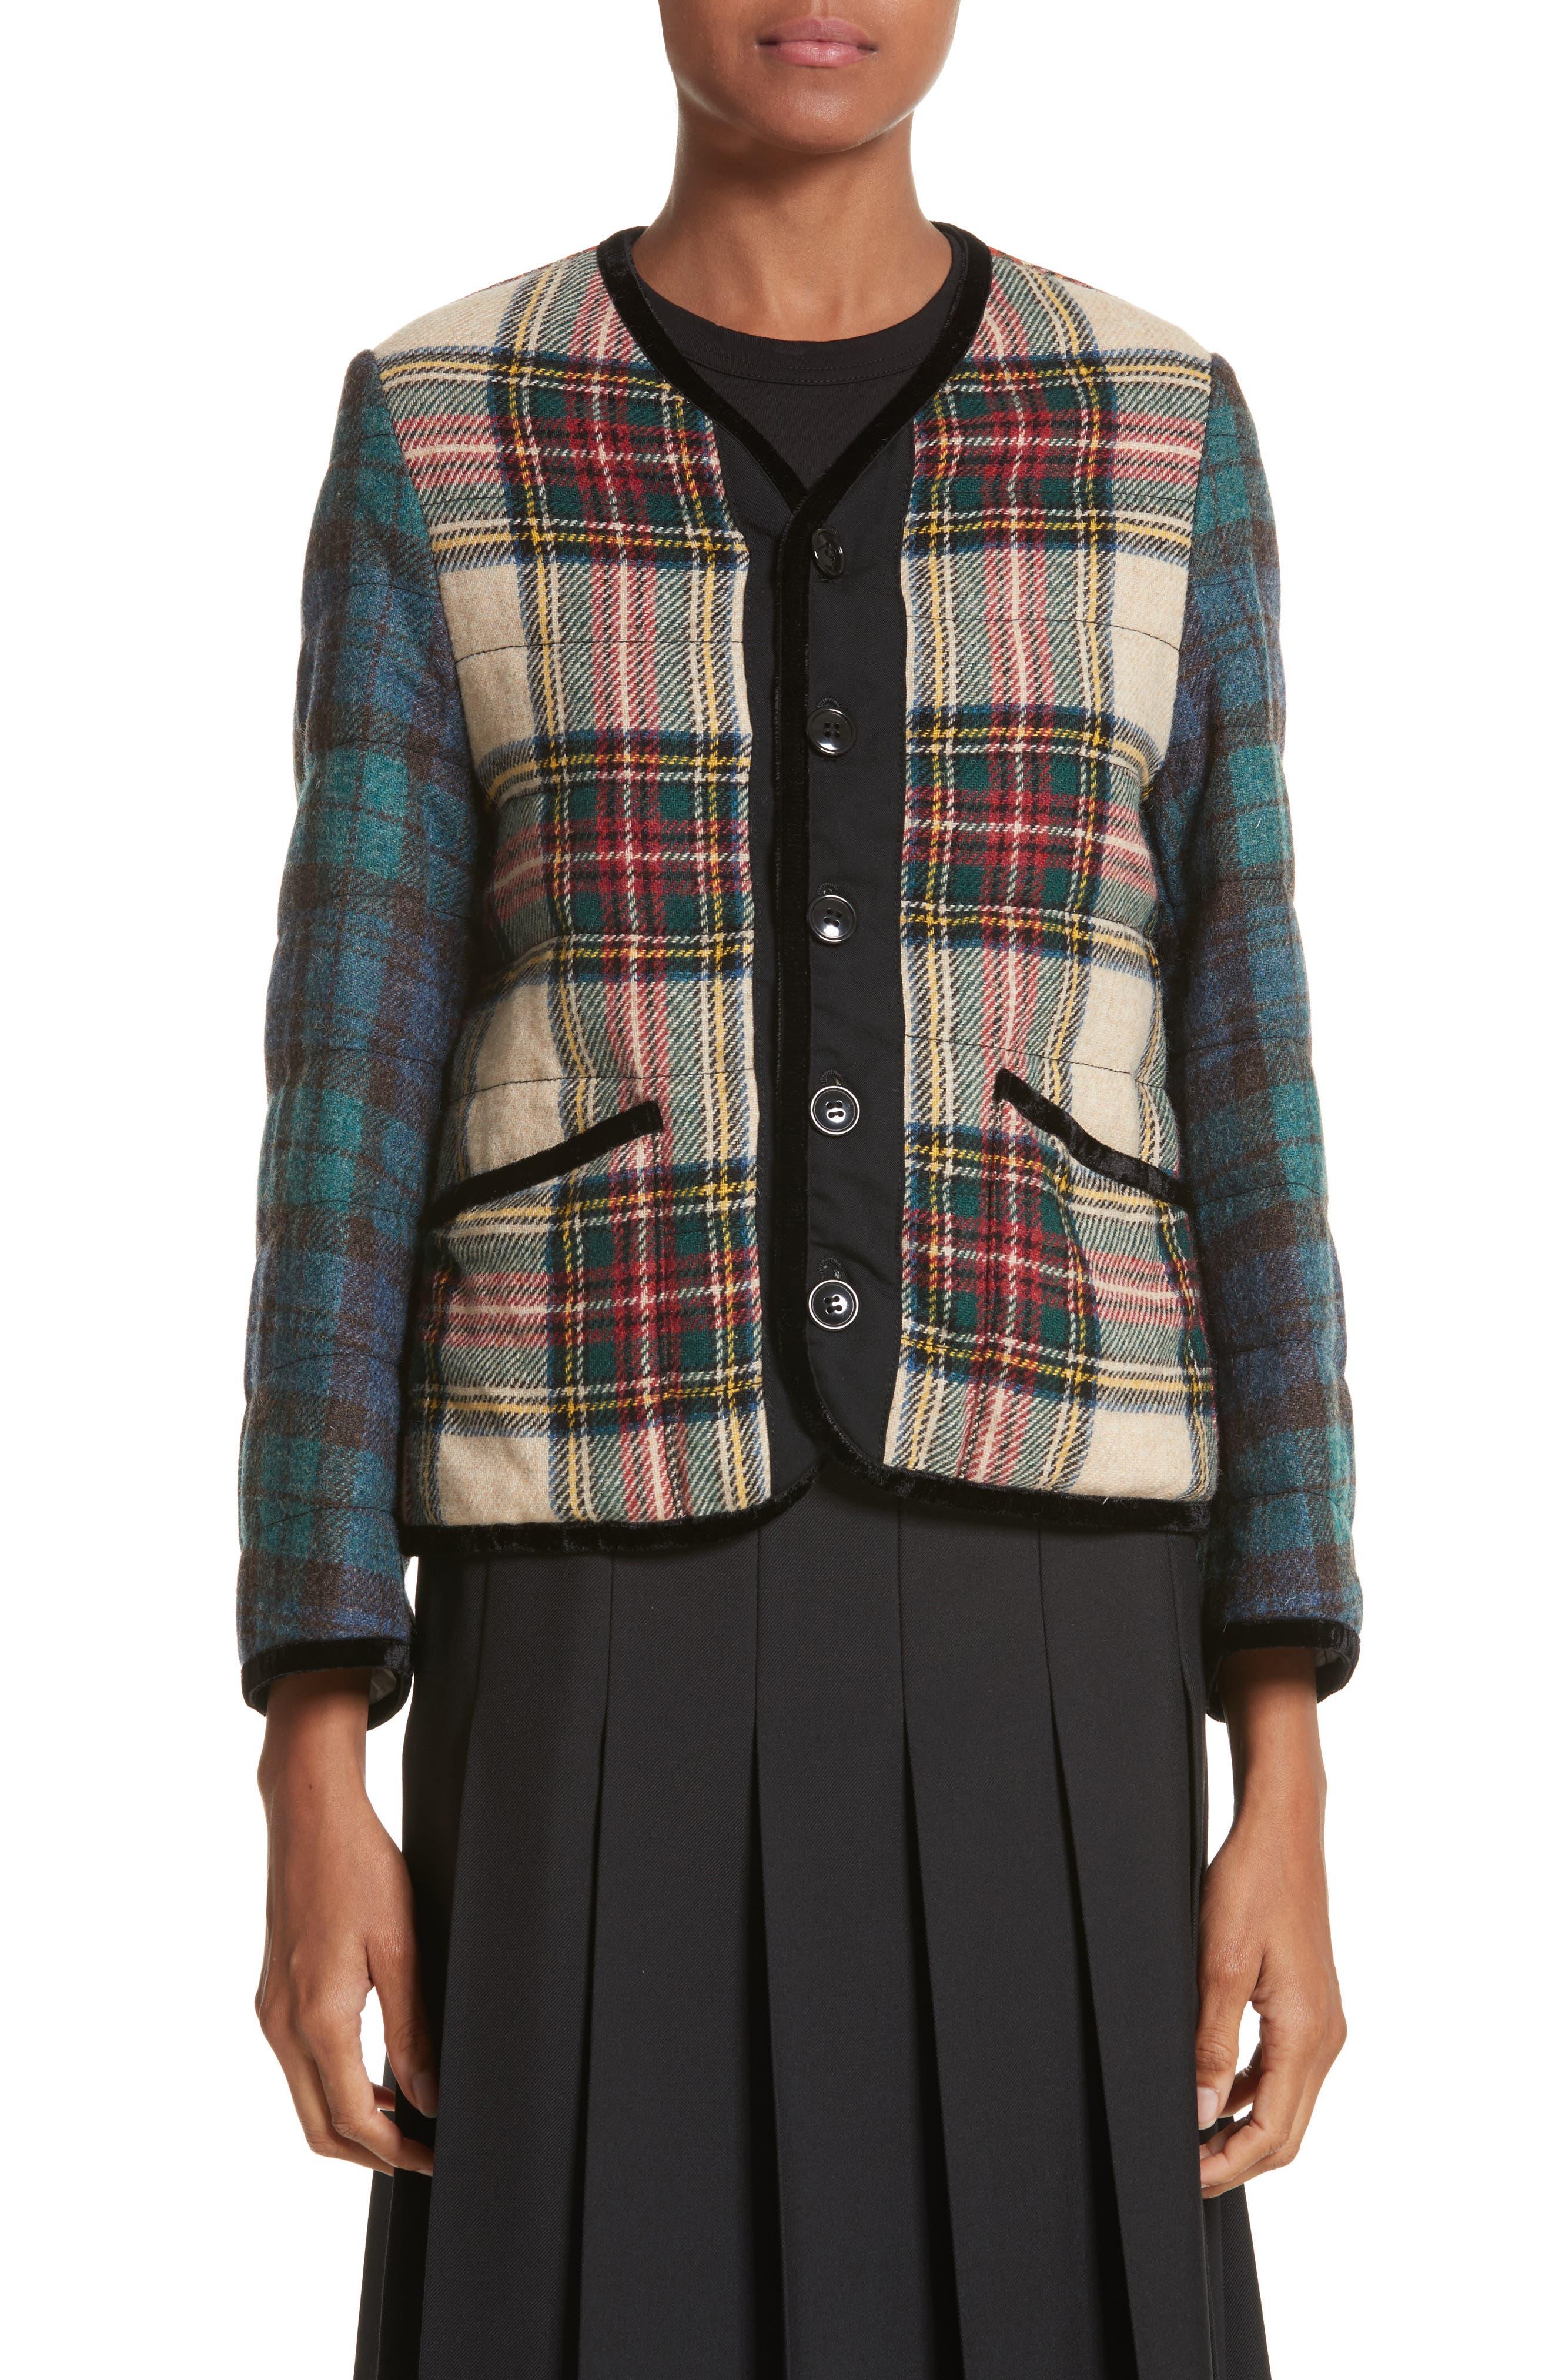 Alternate Image 1 Selected - Tricot Comme des Garçons Mixed Tartan Wool Jacket